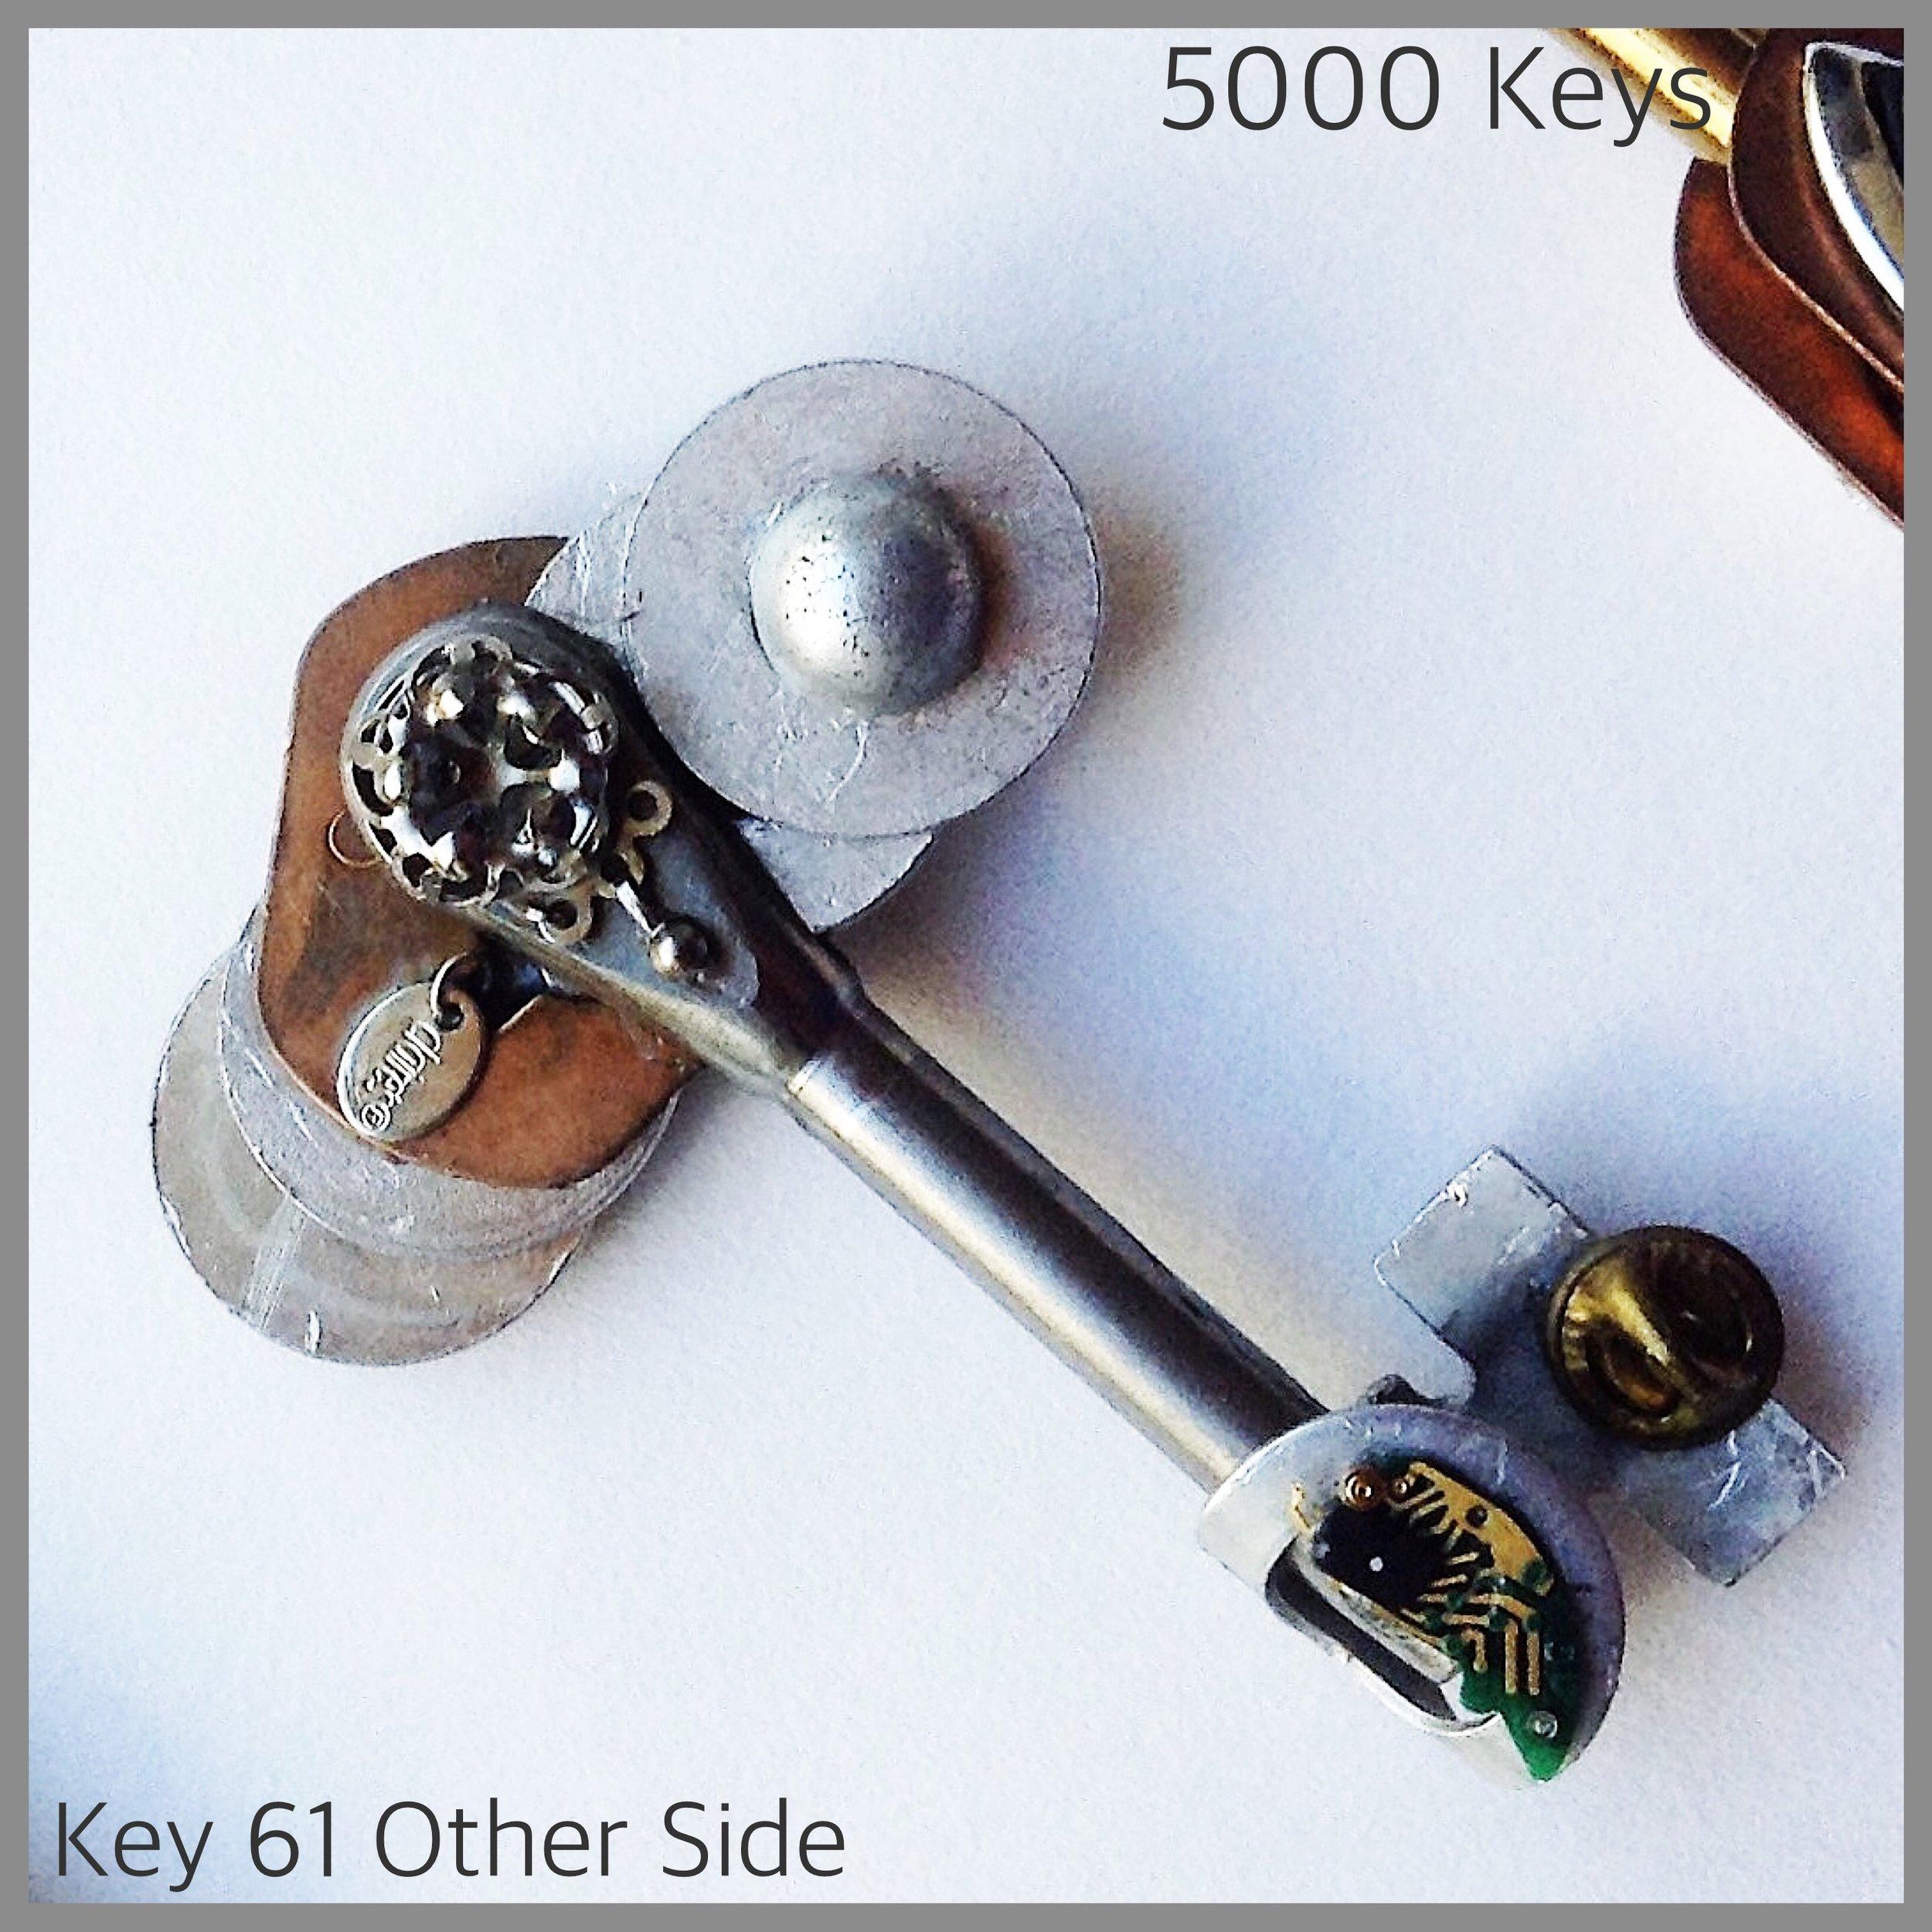 Key 61 other side - 1.JPG